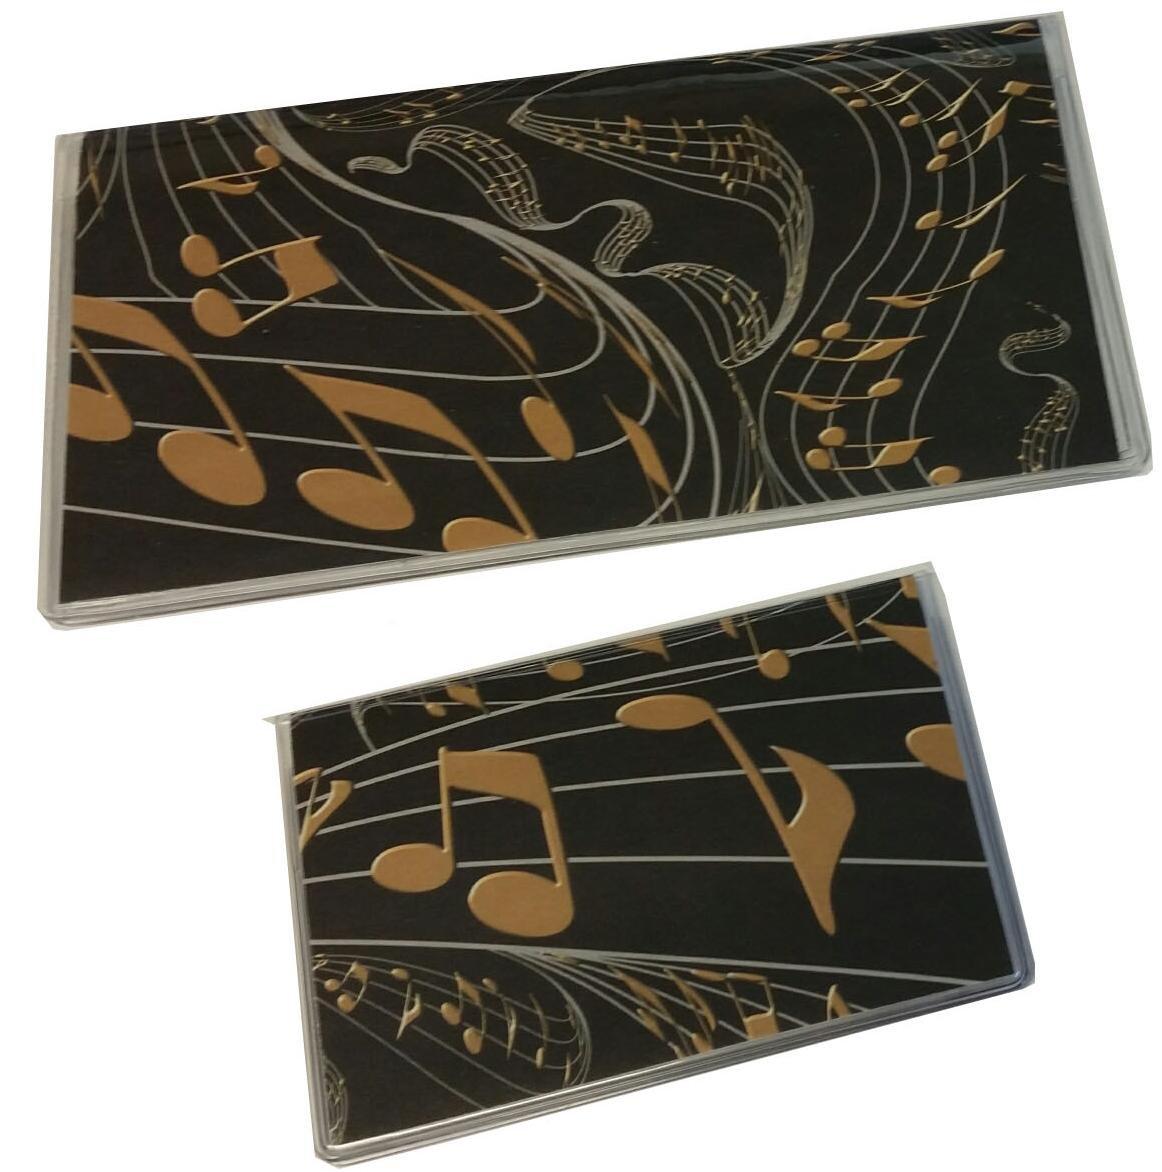 Black & Gold Music Set 2018-2019 Planner and Debit Card Holder with Register